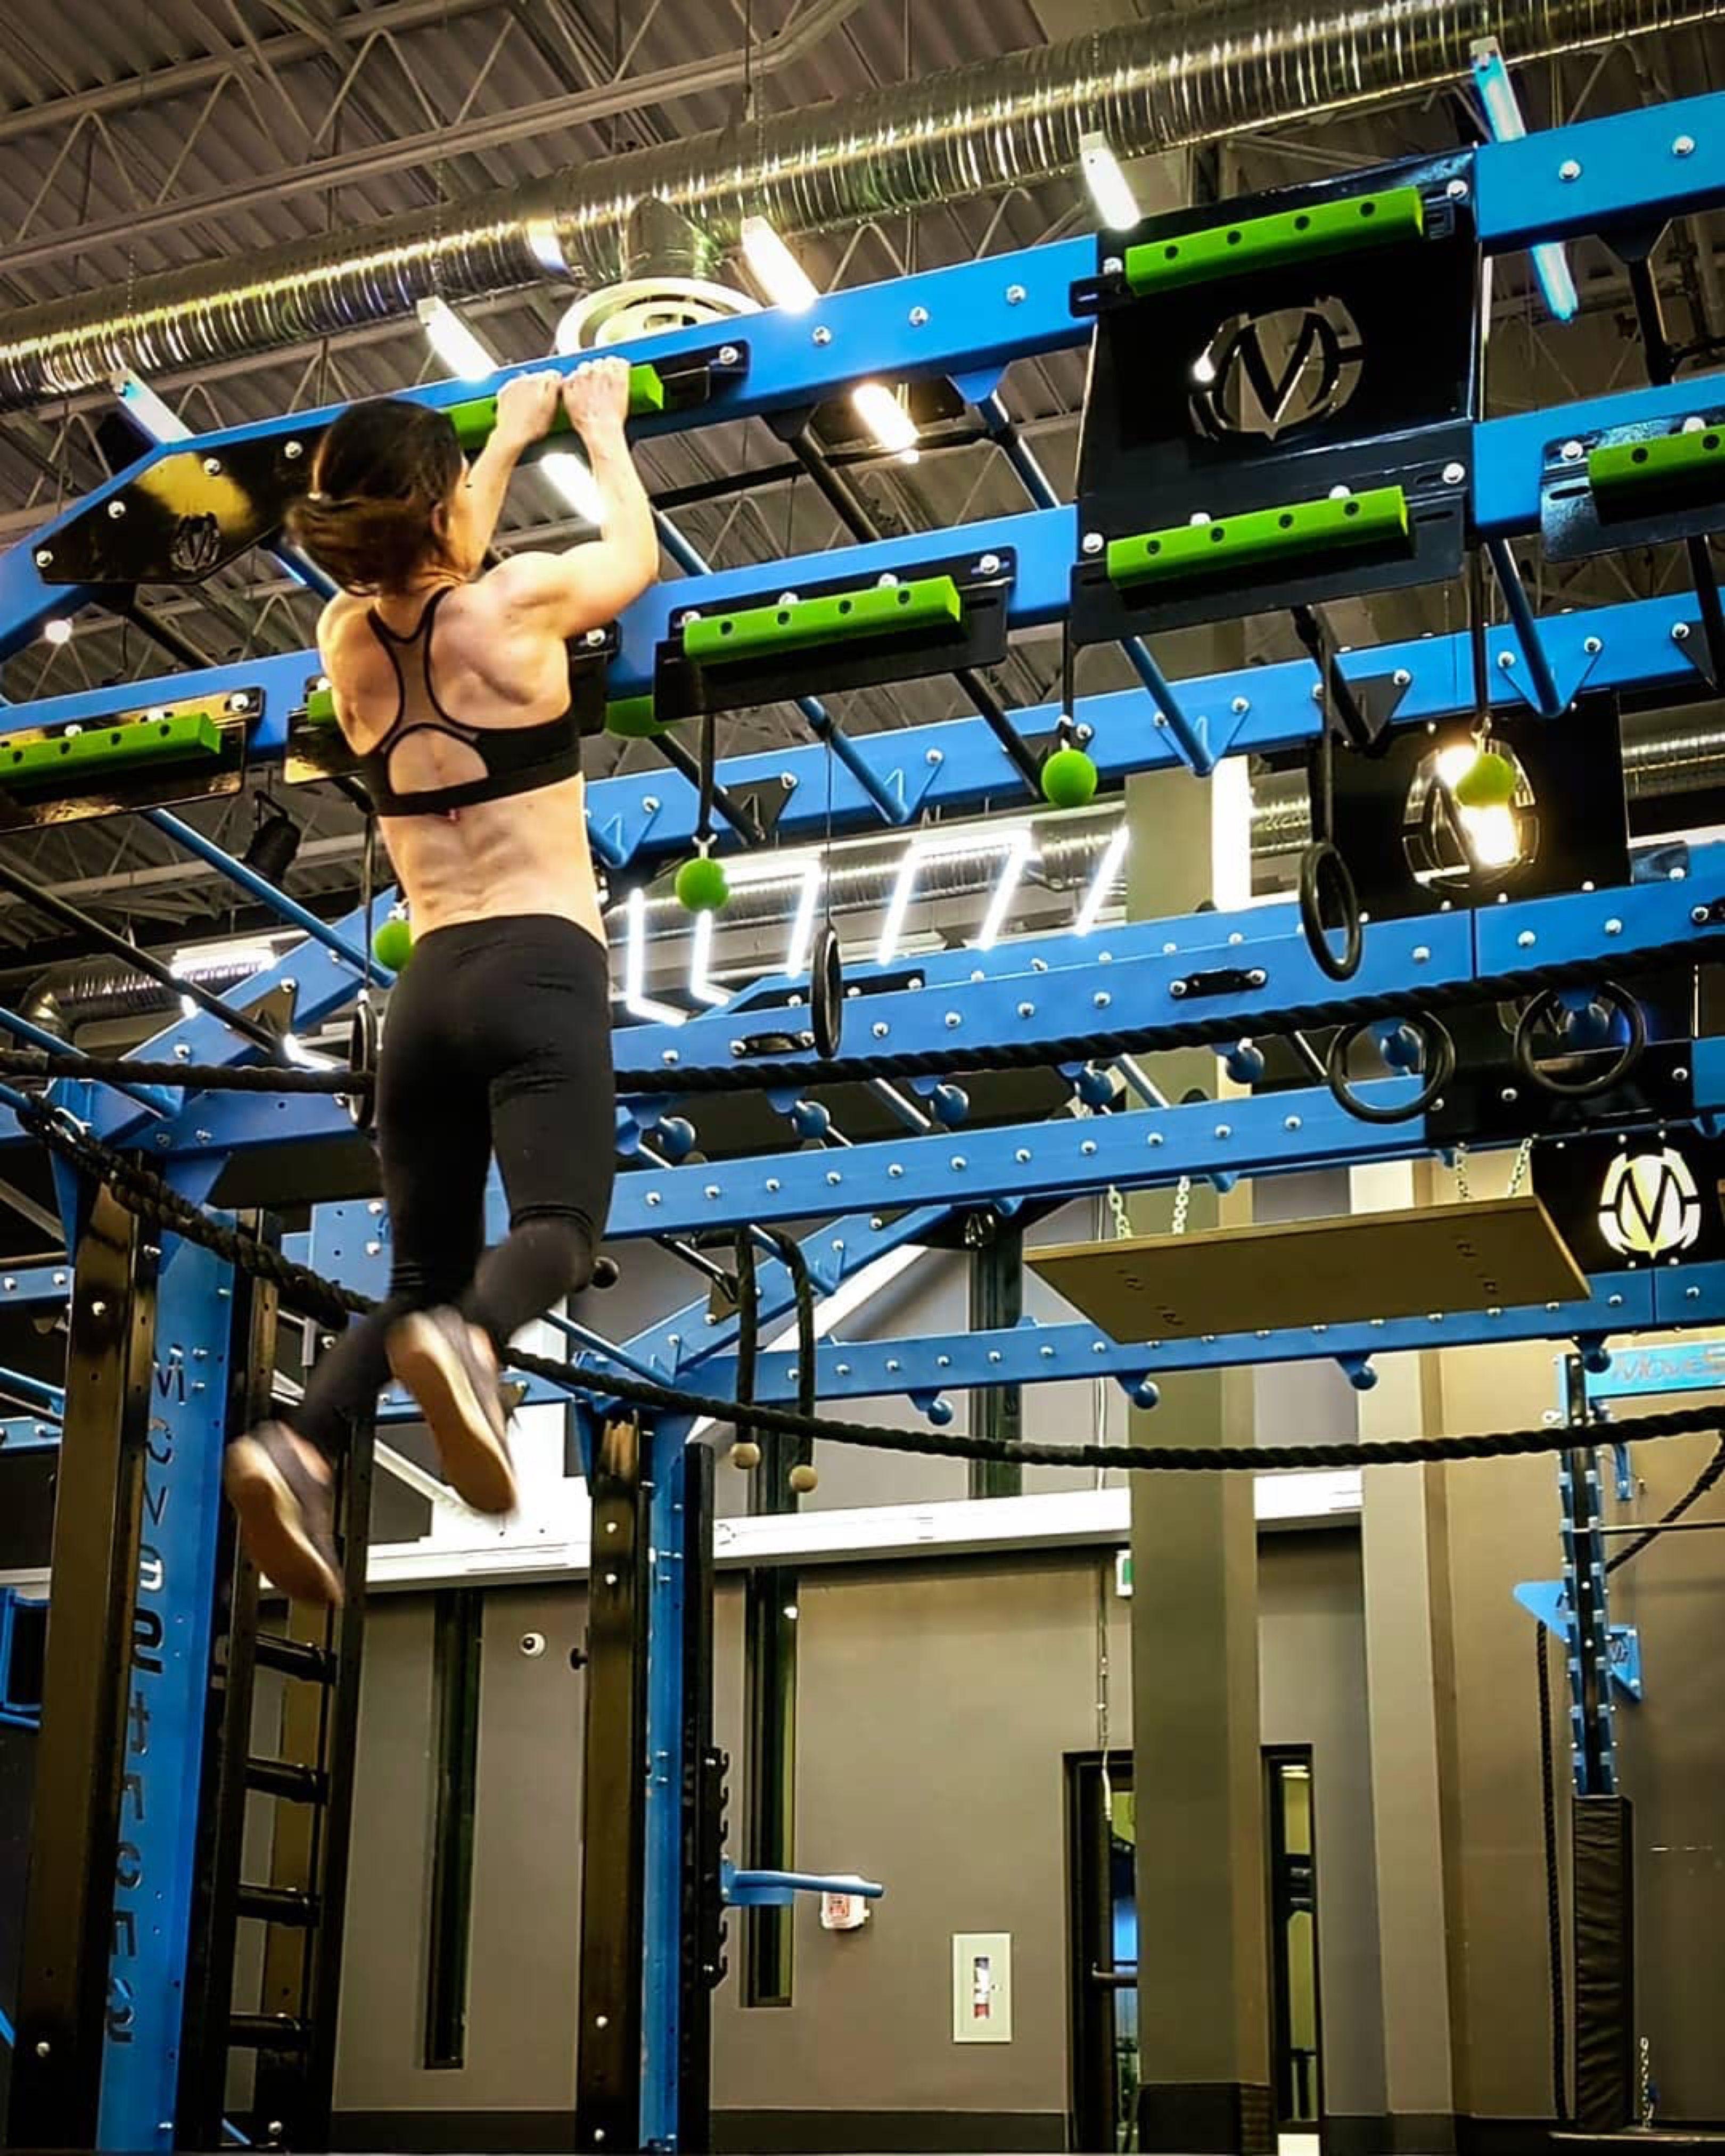 Cliff Hanger Grip Strength Ninja Warrior Training Ninja Warrior Course Gym Wallpaper Gym Interior